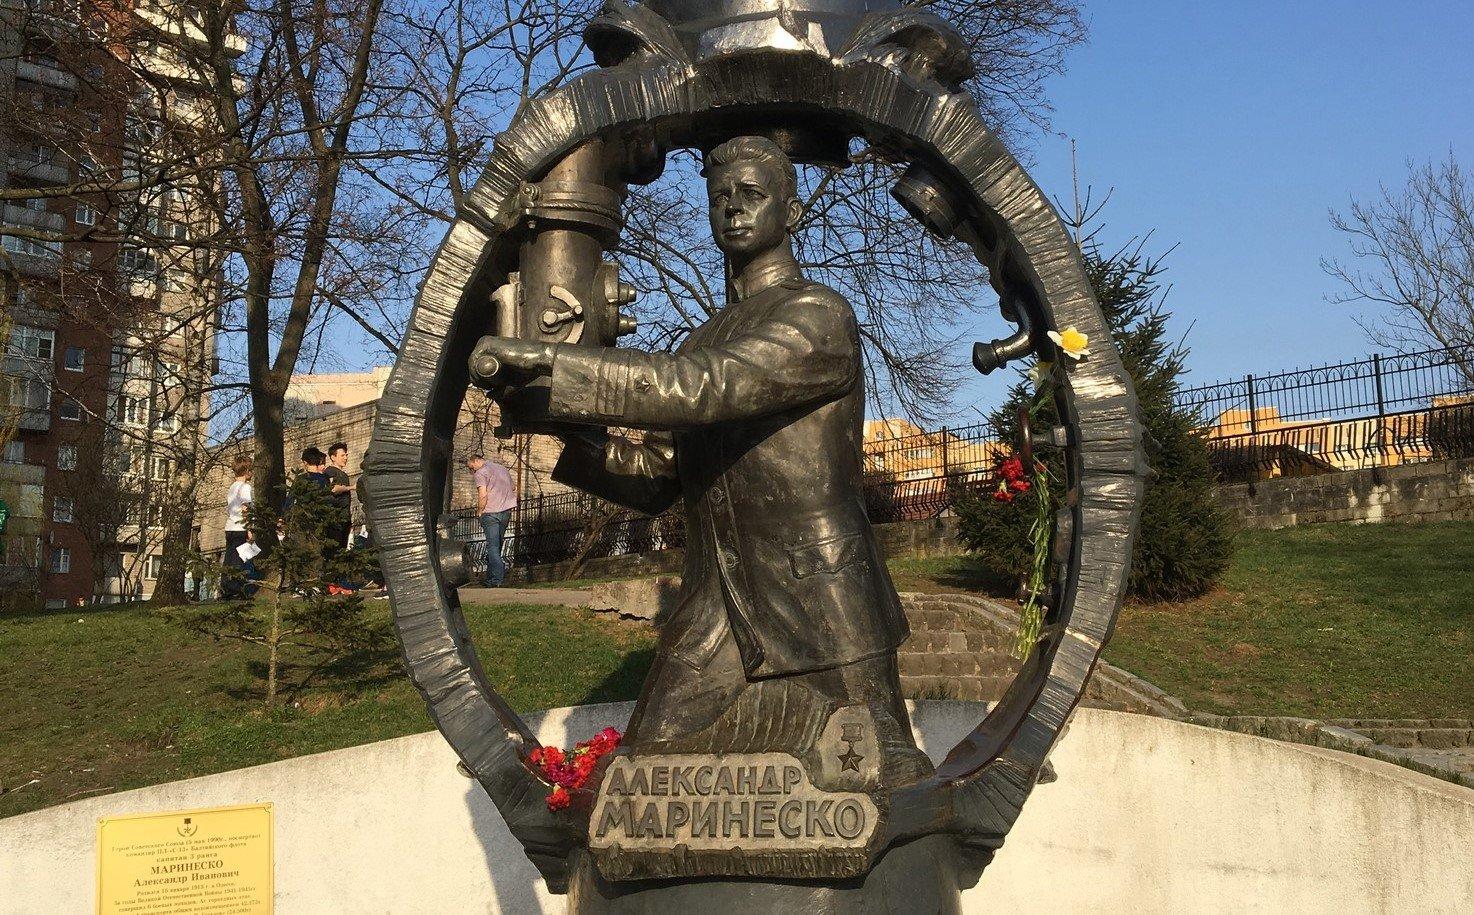 Marinesko Monument, Kaliningrad